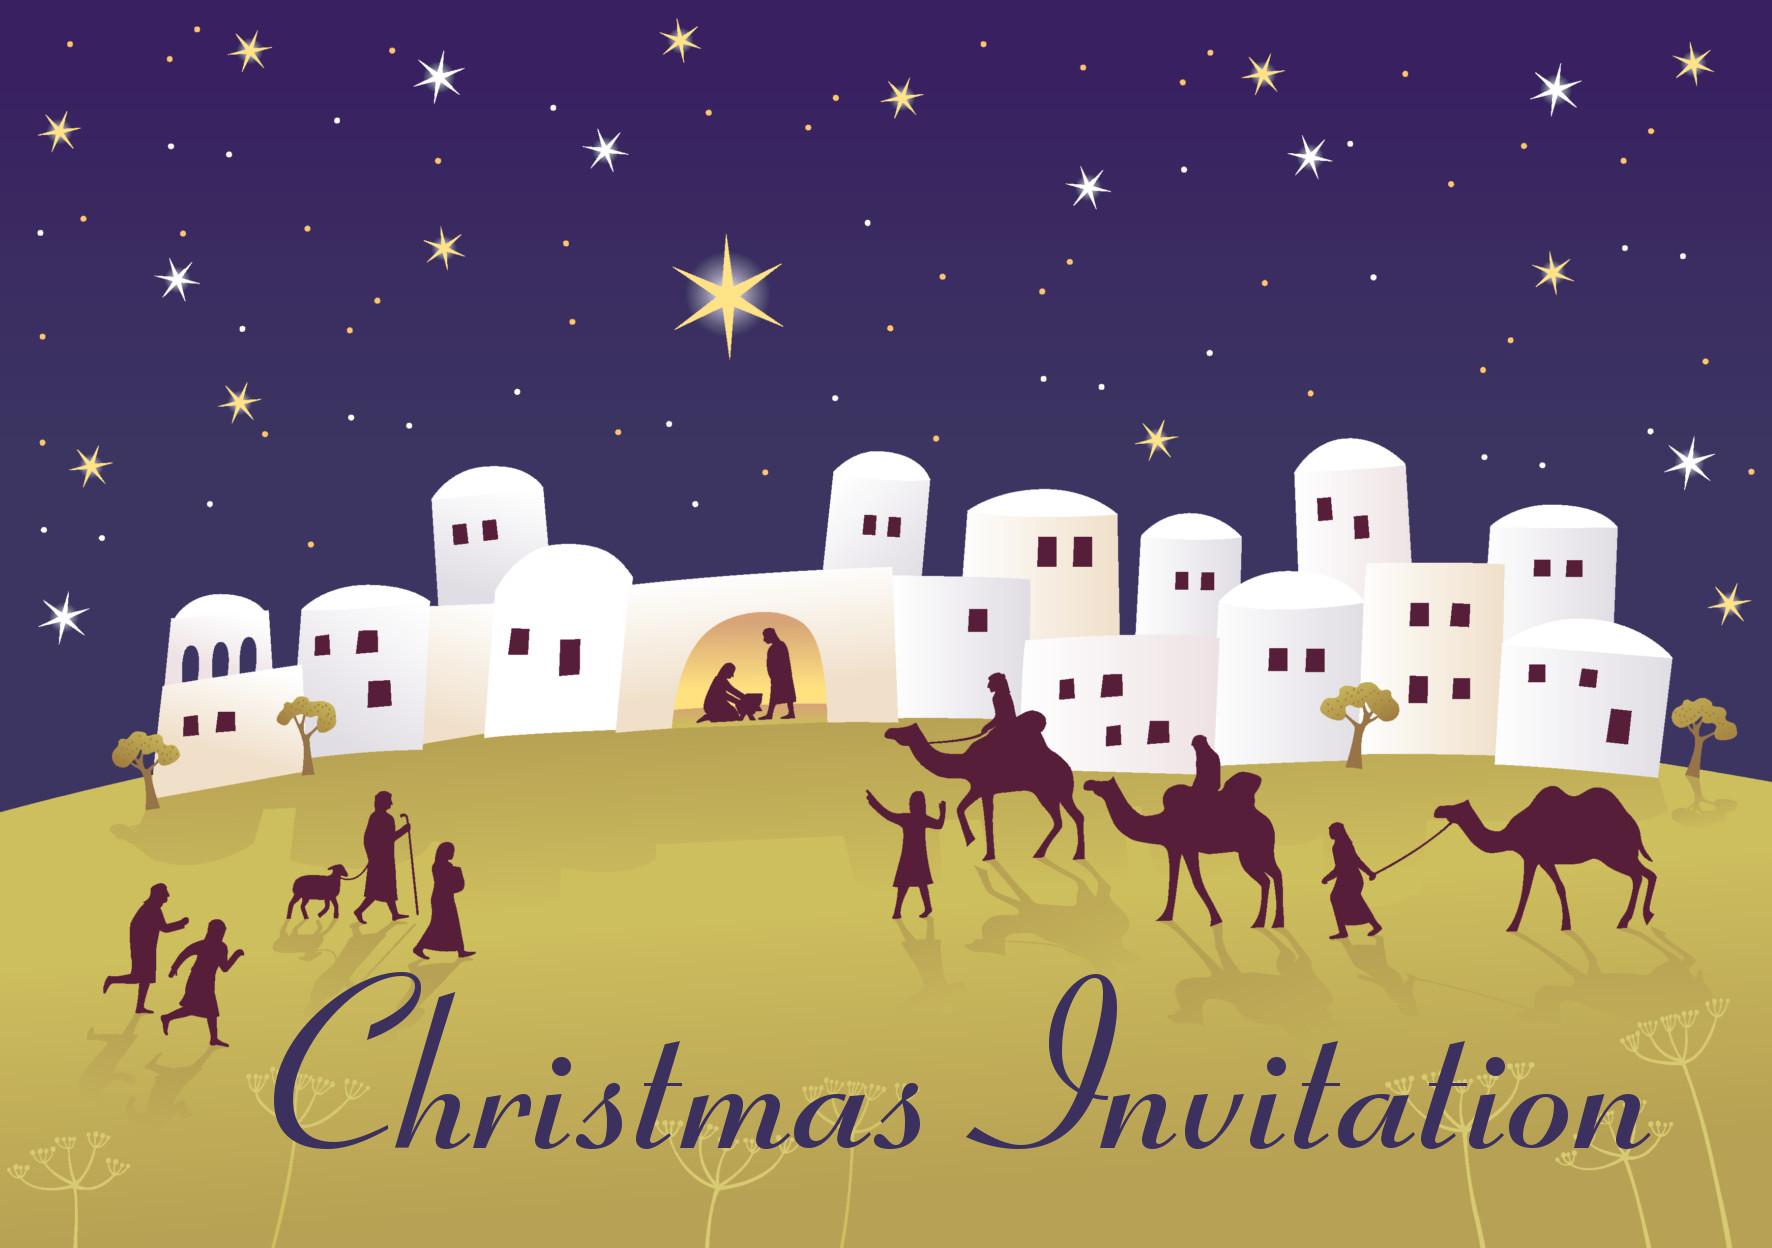 Christmas Invitation 2019